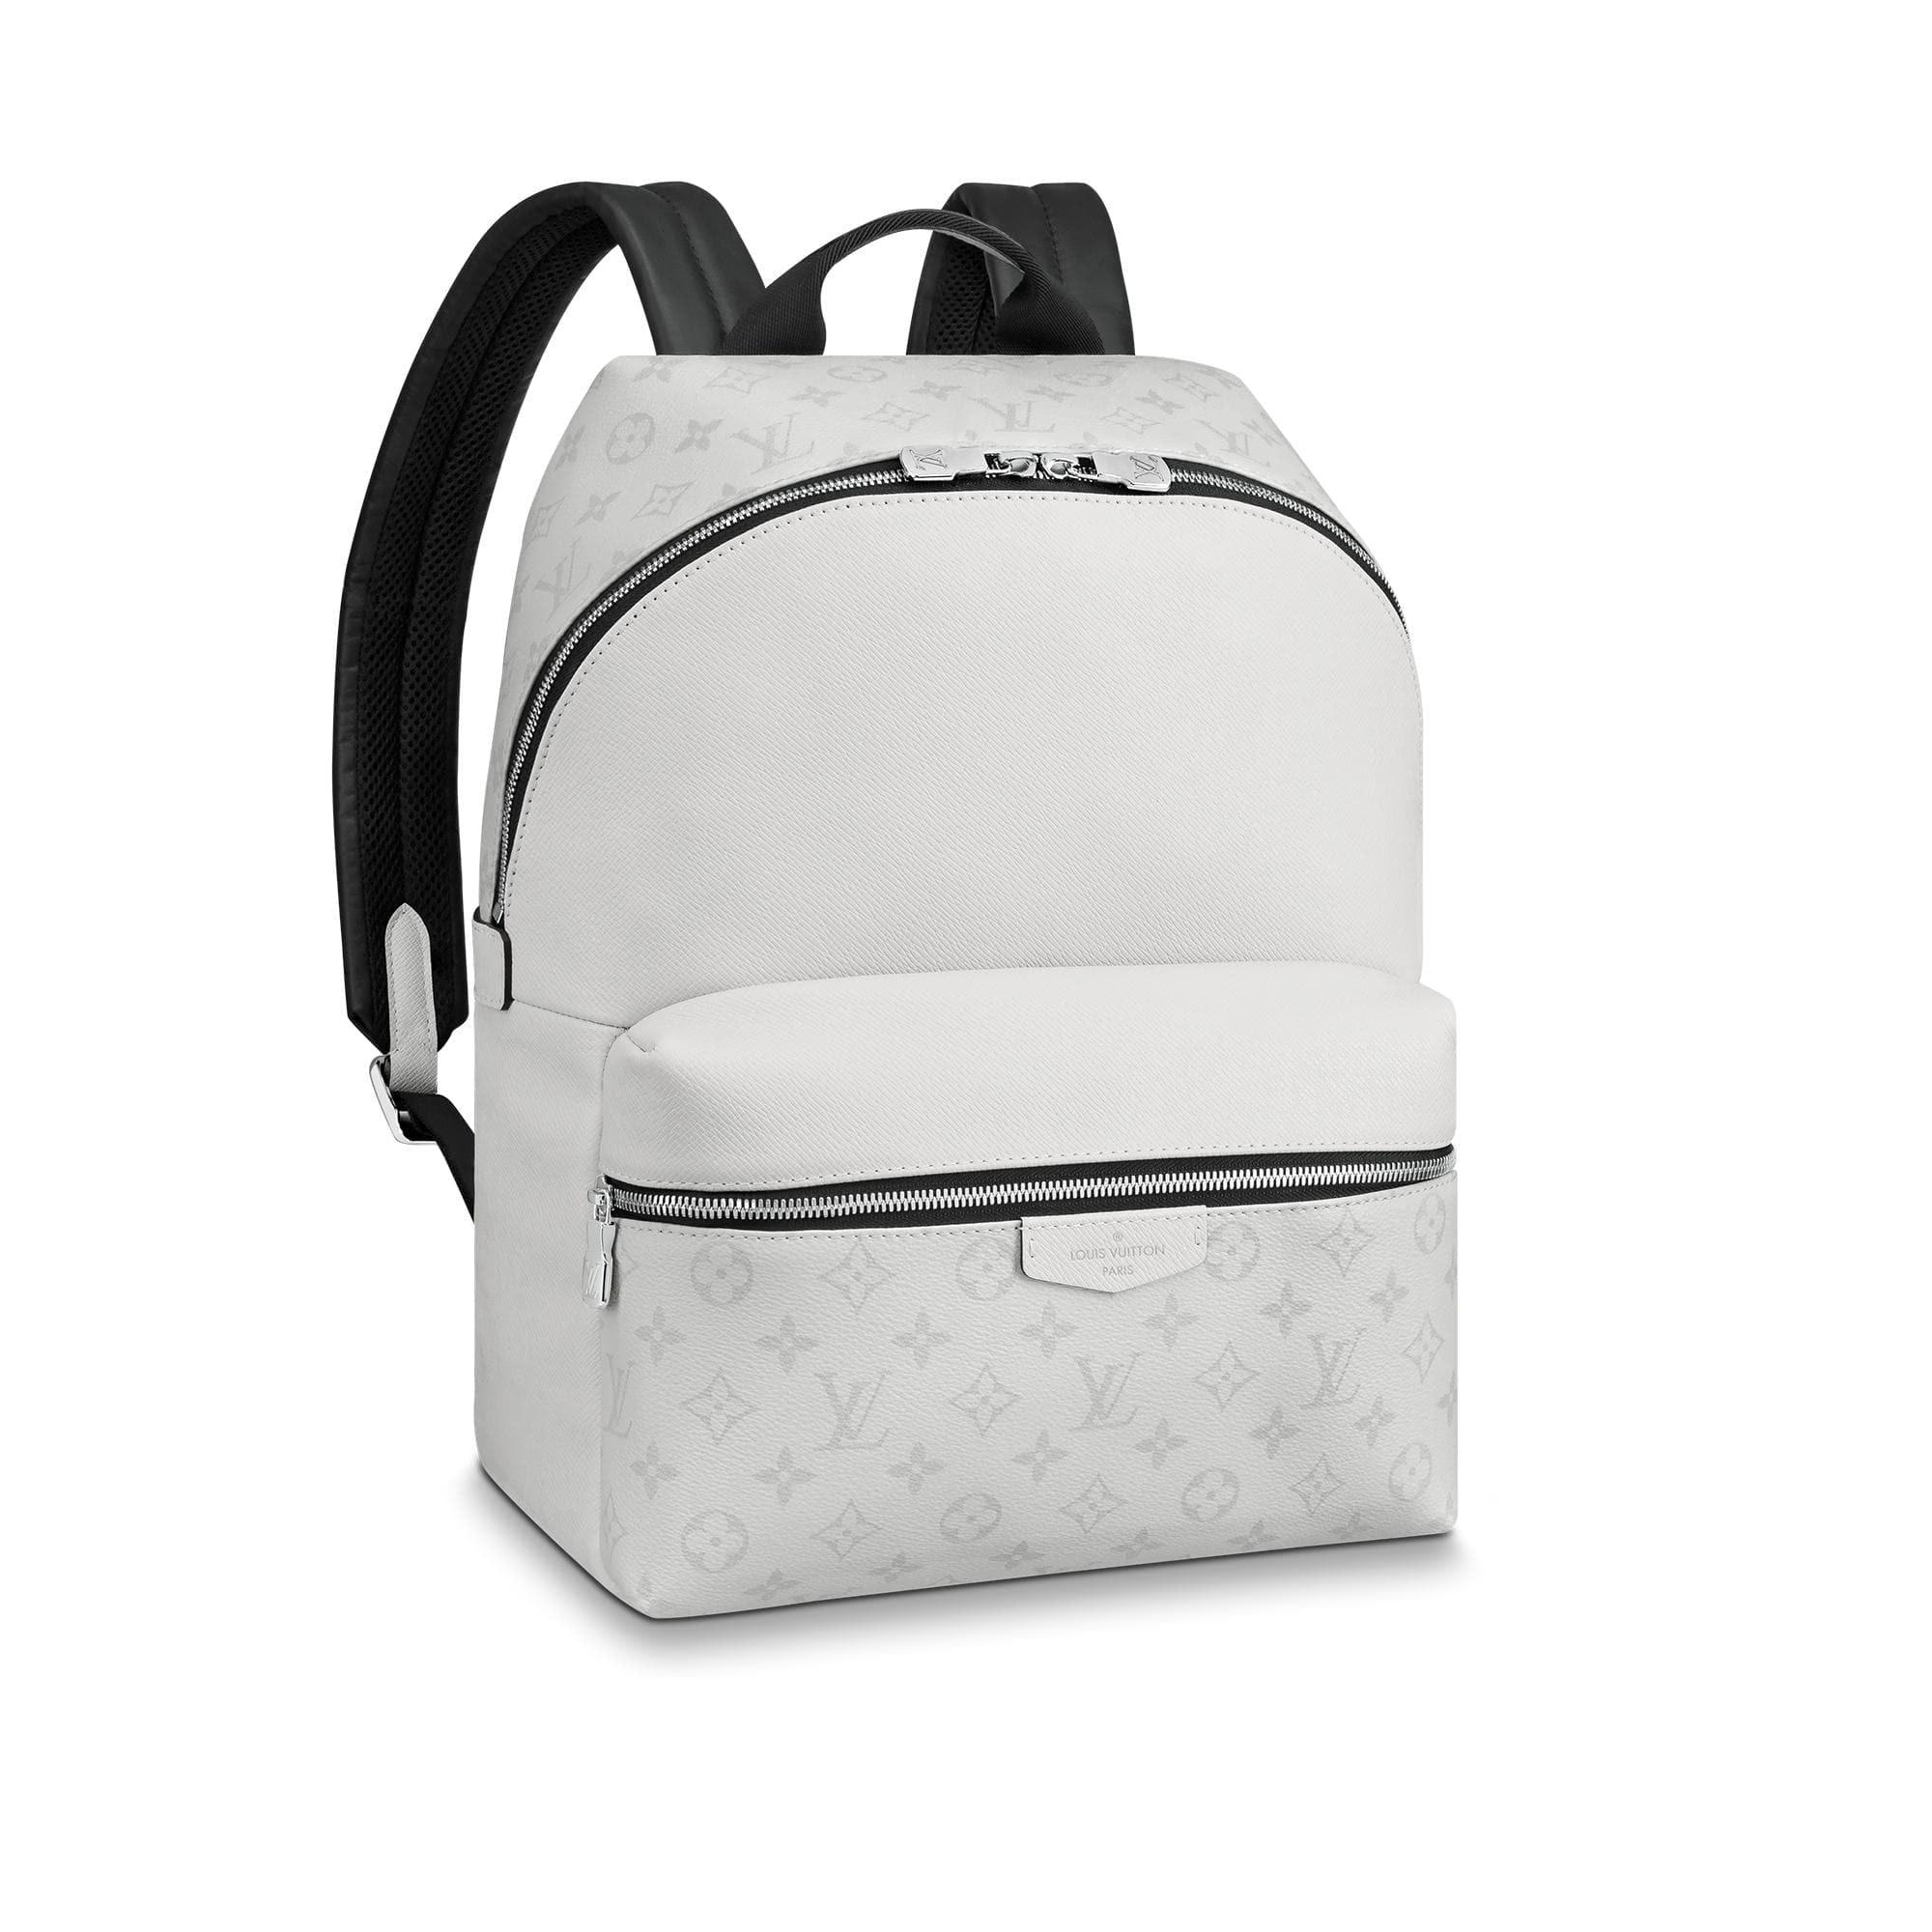 Louis Vuitton Discovery Backpack Monogram Antarctica Taiga PM White